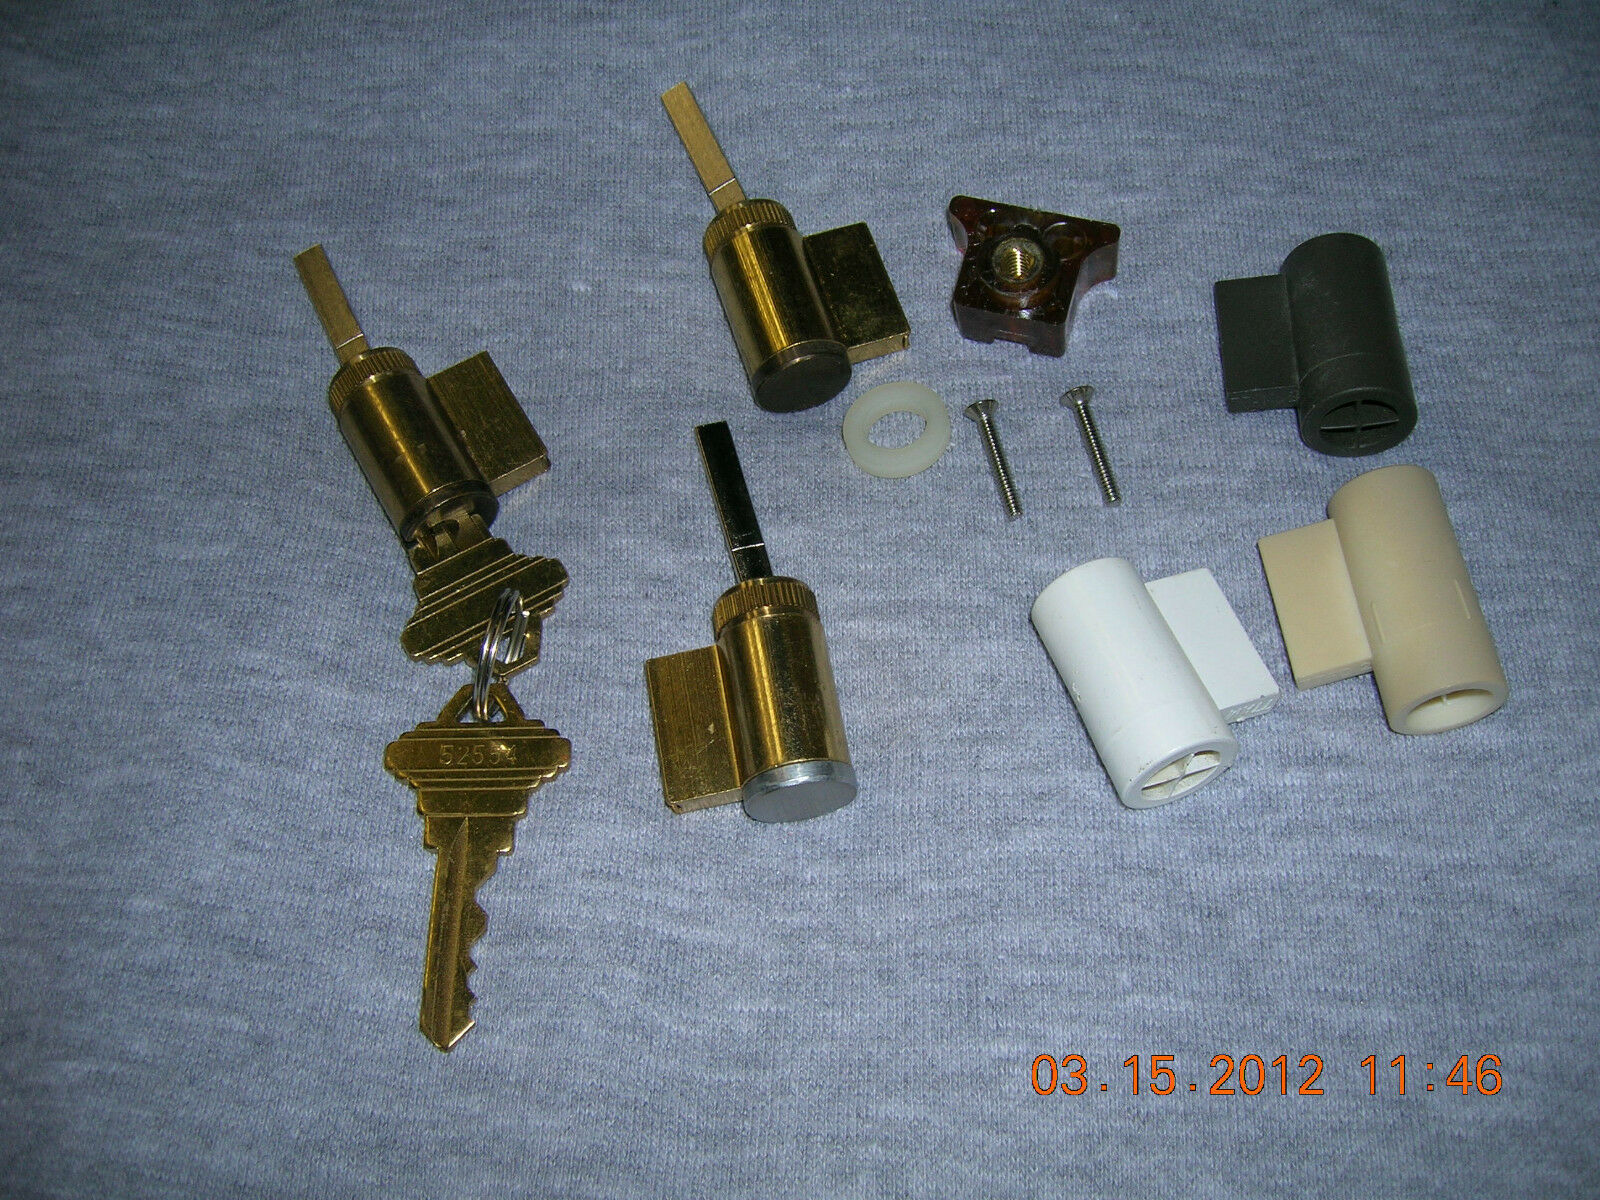 ((pella)) Keyed Lock Cylinders-door Parts-accessories-hardware